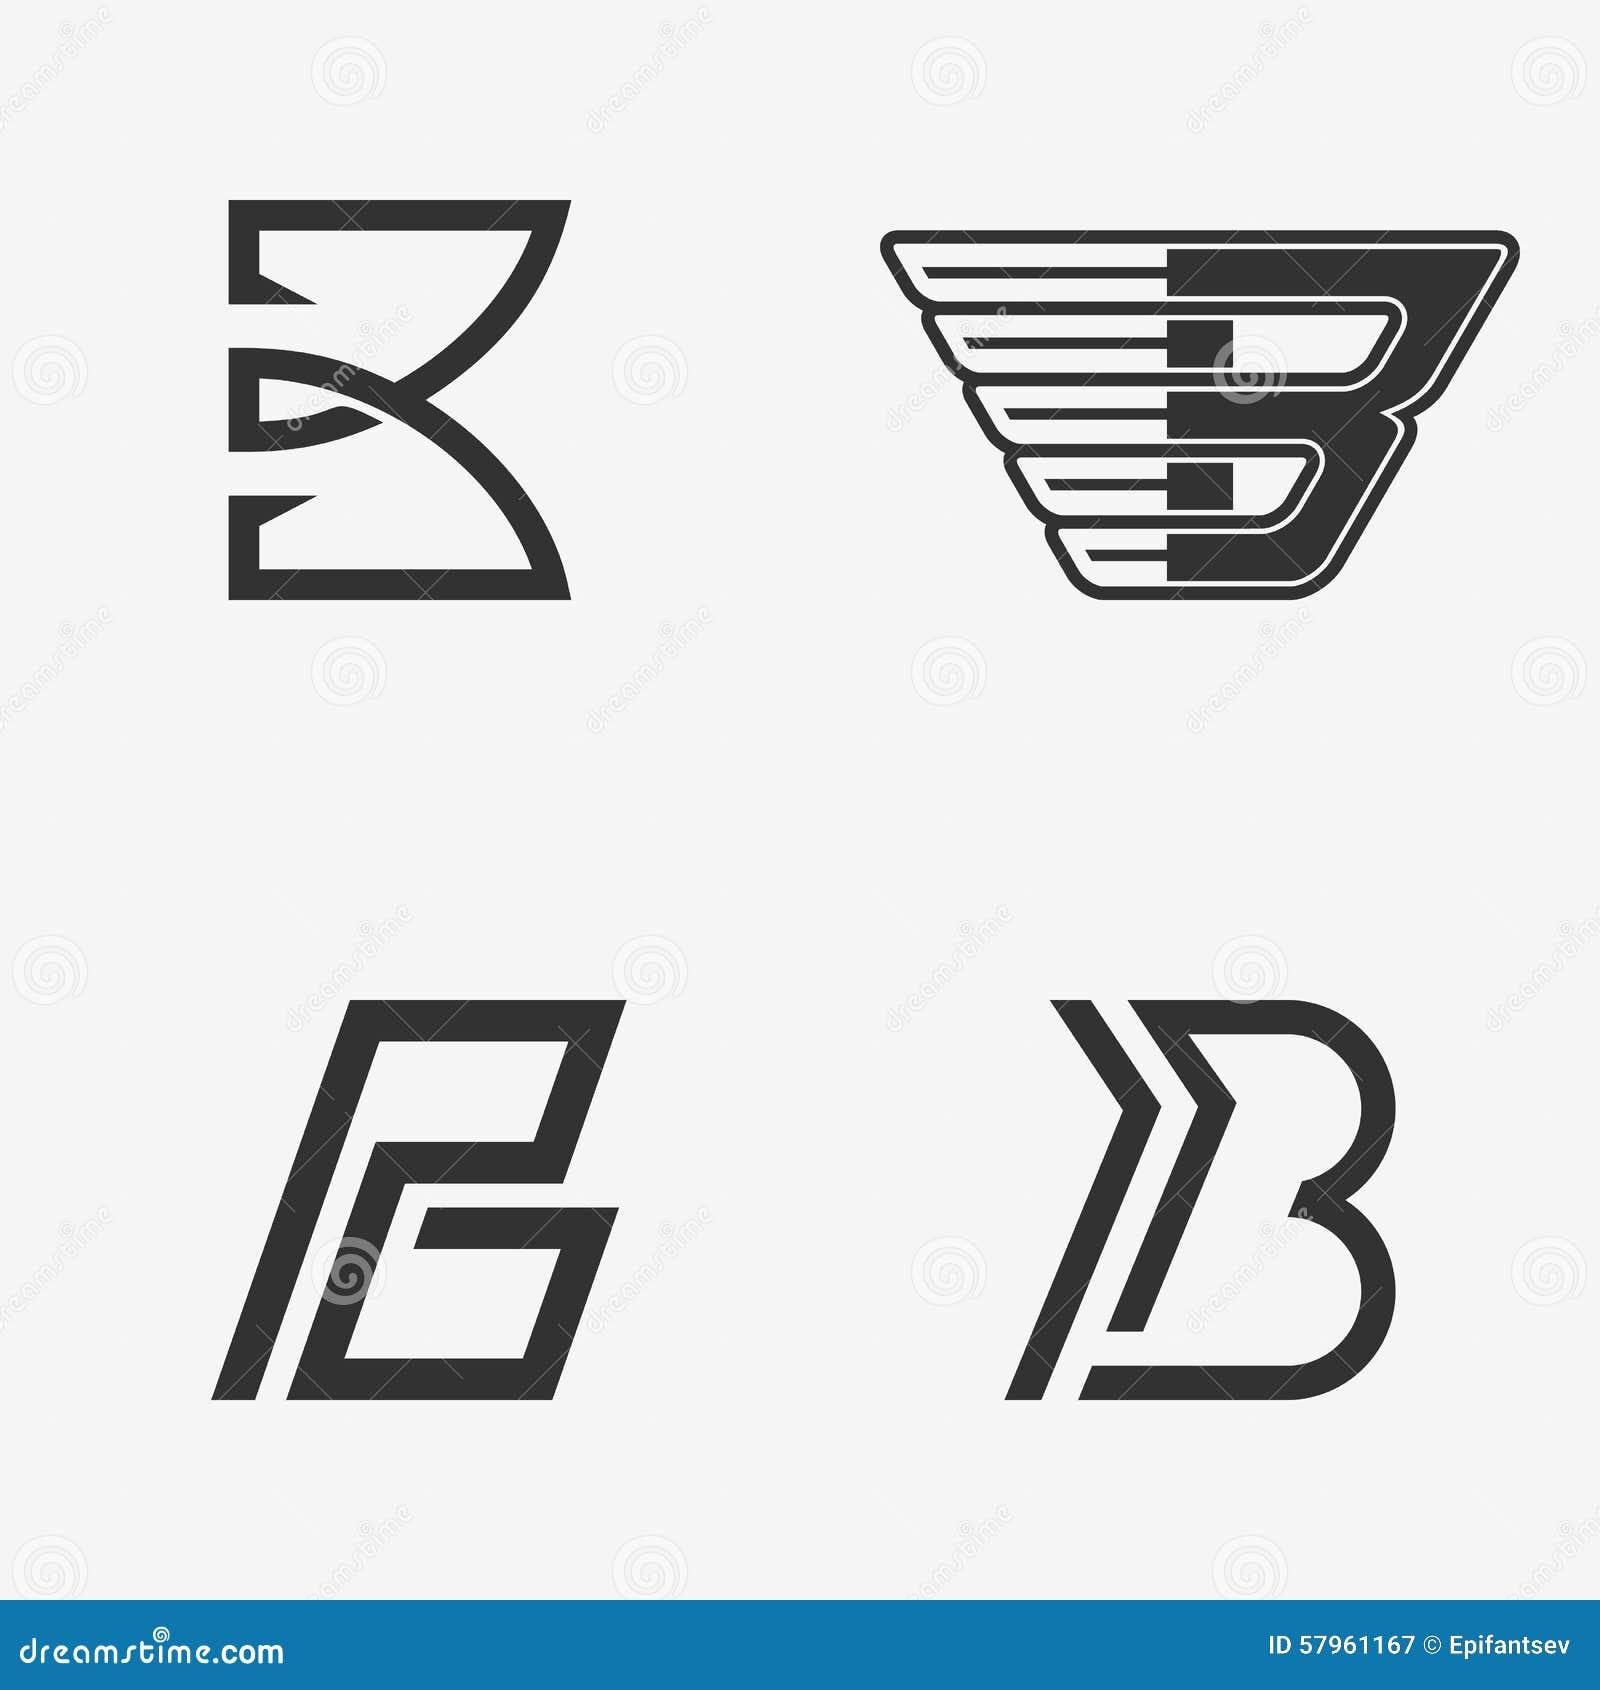 The set of letter b sign logo icon design template elements the set of letter b sign logo icon design template elements pronofoot35fo Image collections